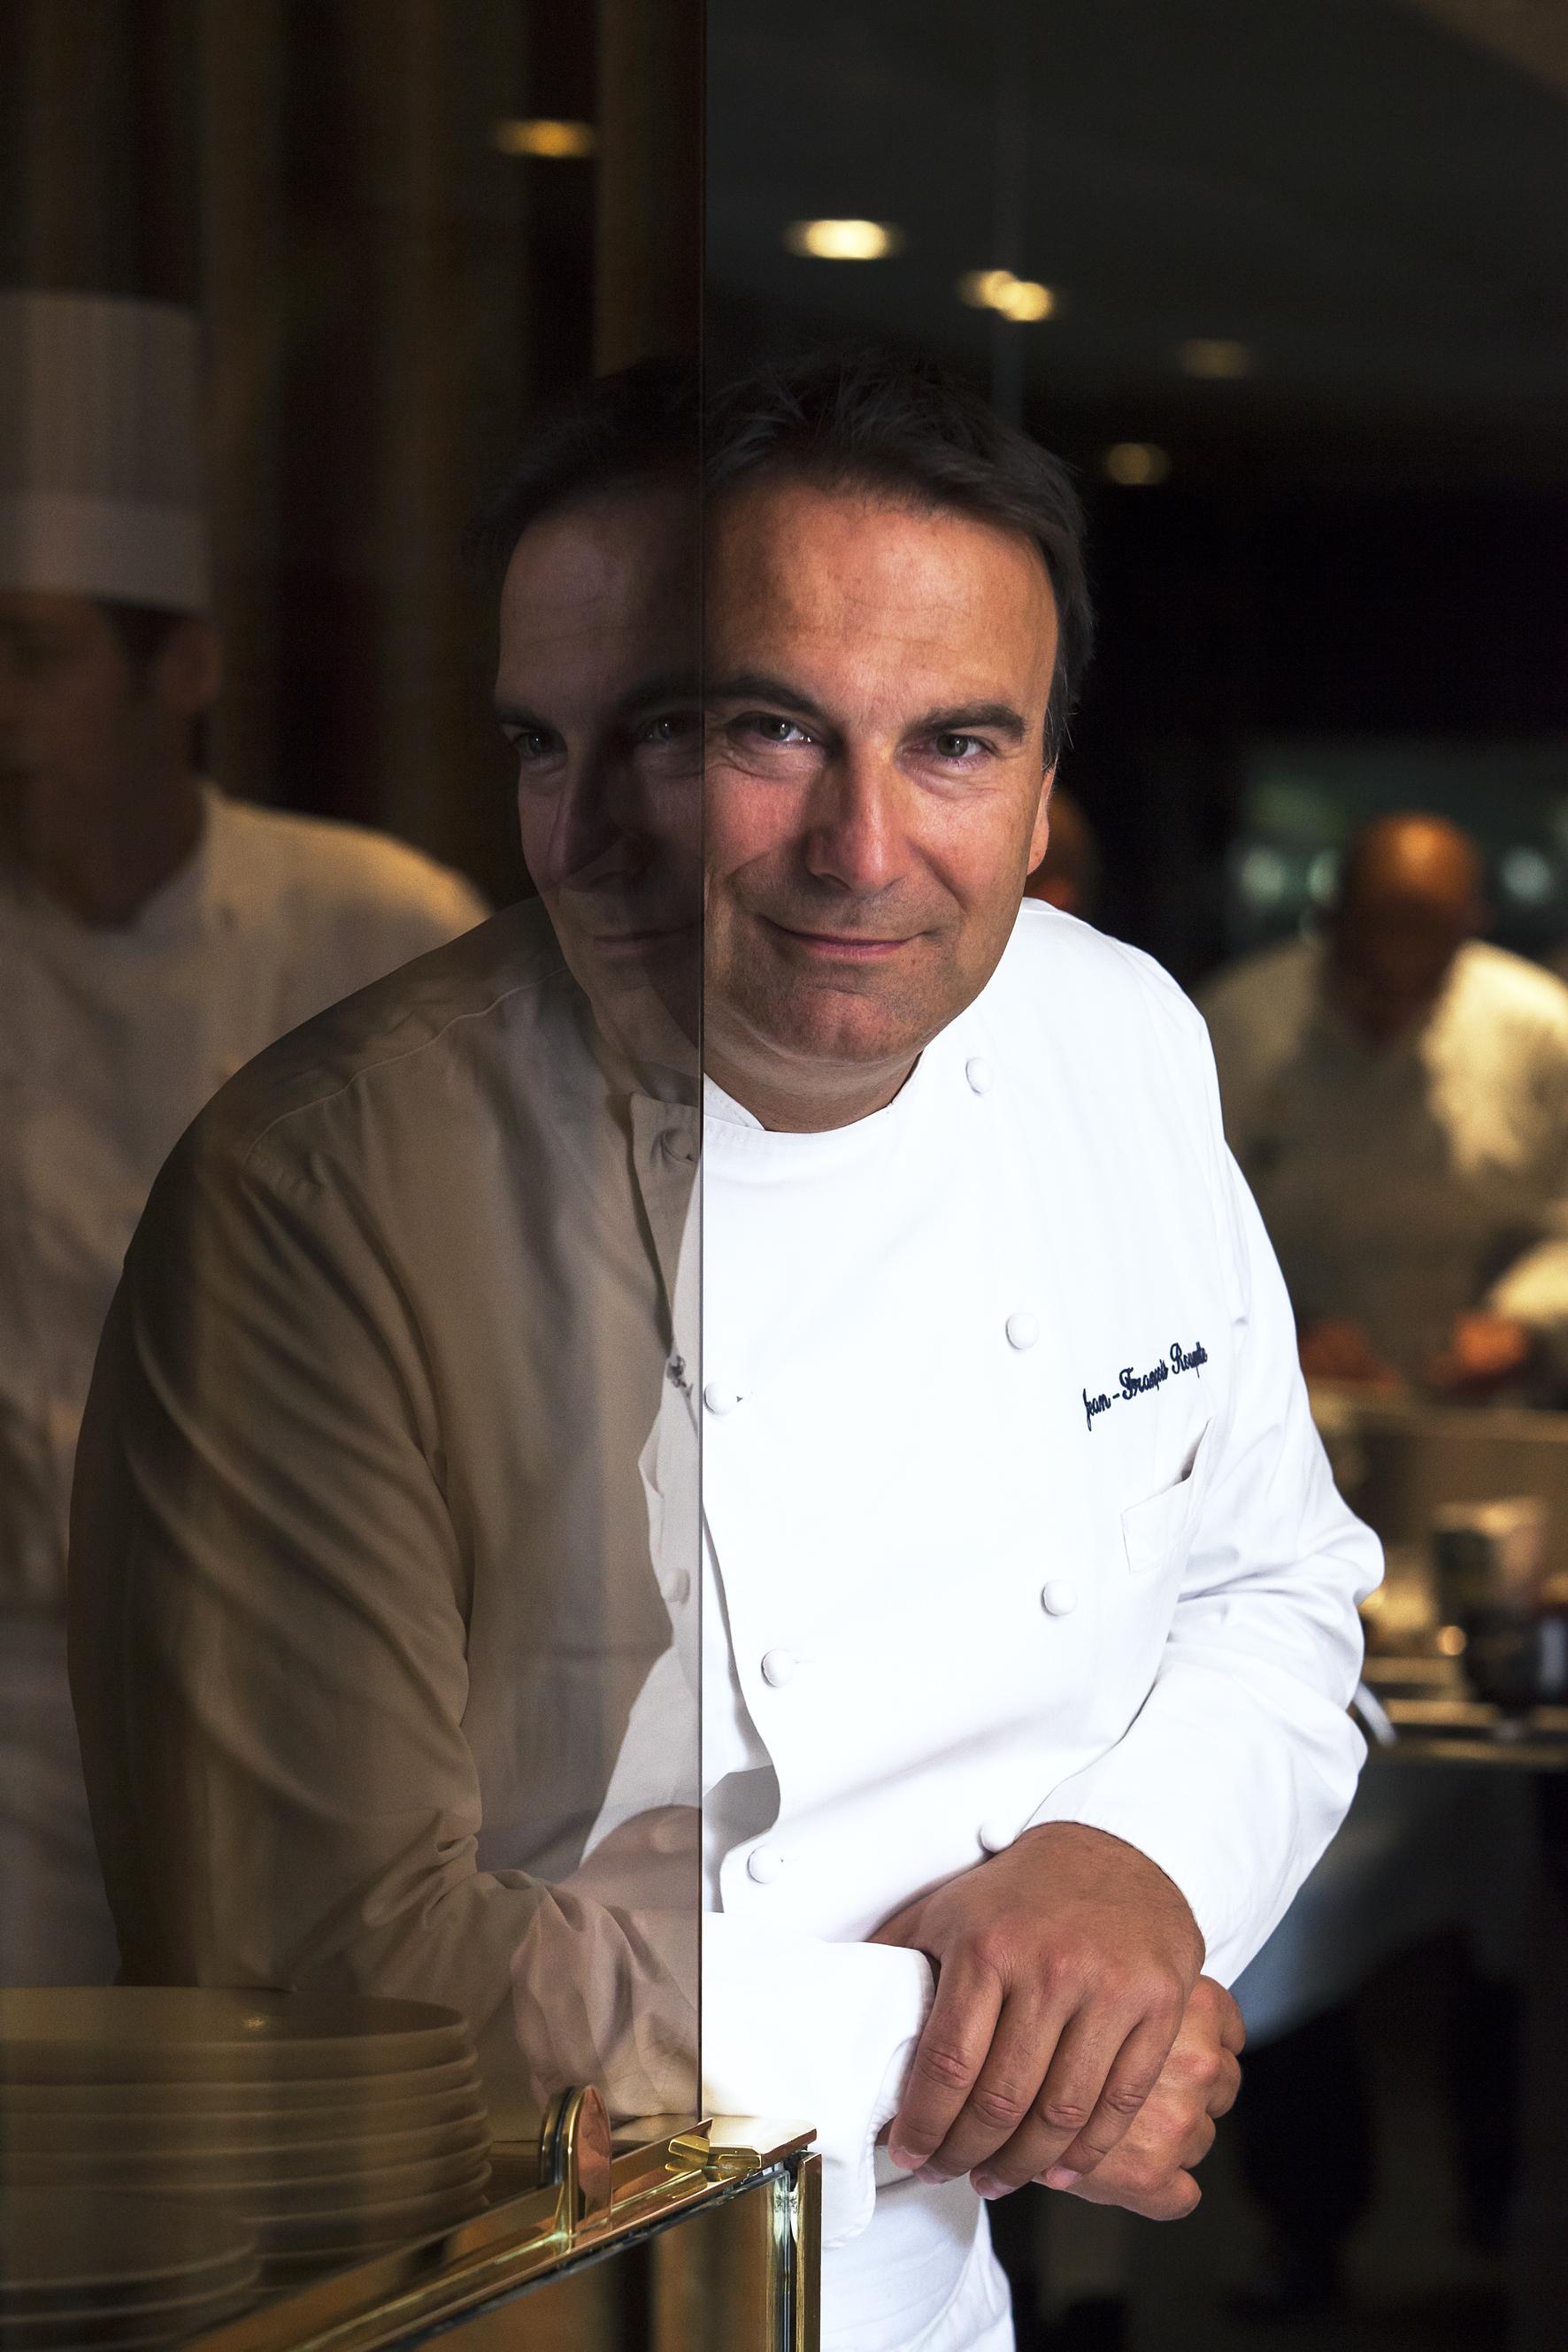 Chef Jean-Francois Rouquette - Michelin Star Restaurant in Paris